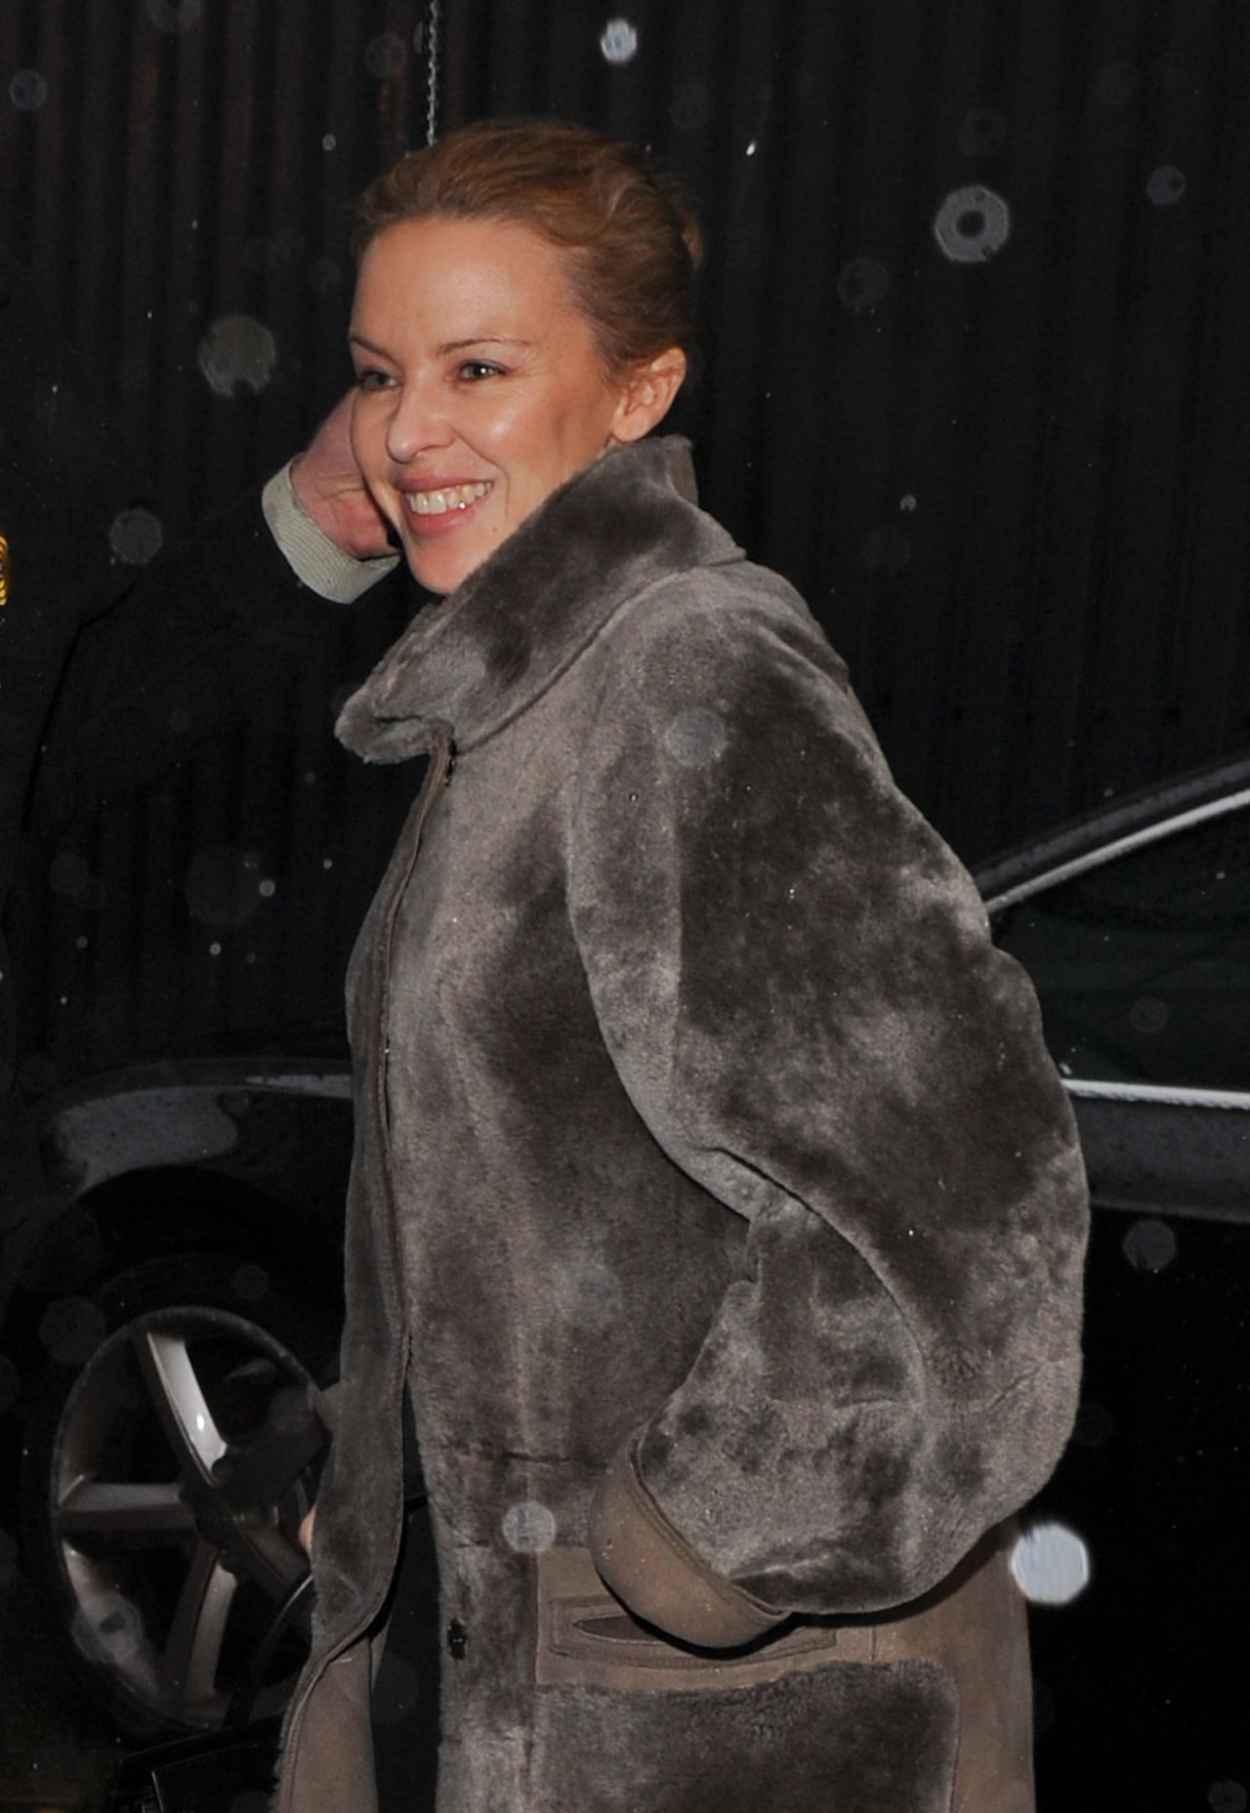 Kylie Minogue - Leaving a Studio in London, Feb. 2015-1